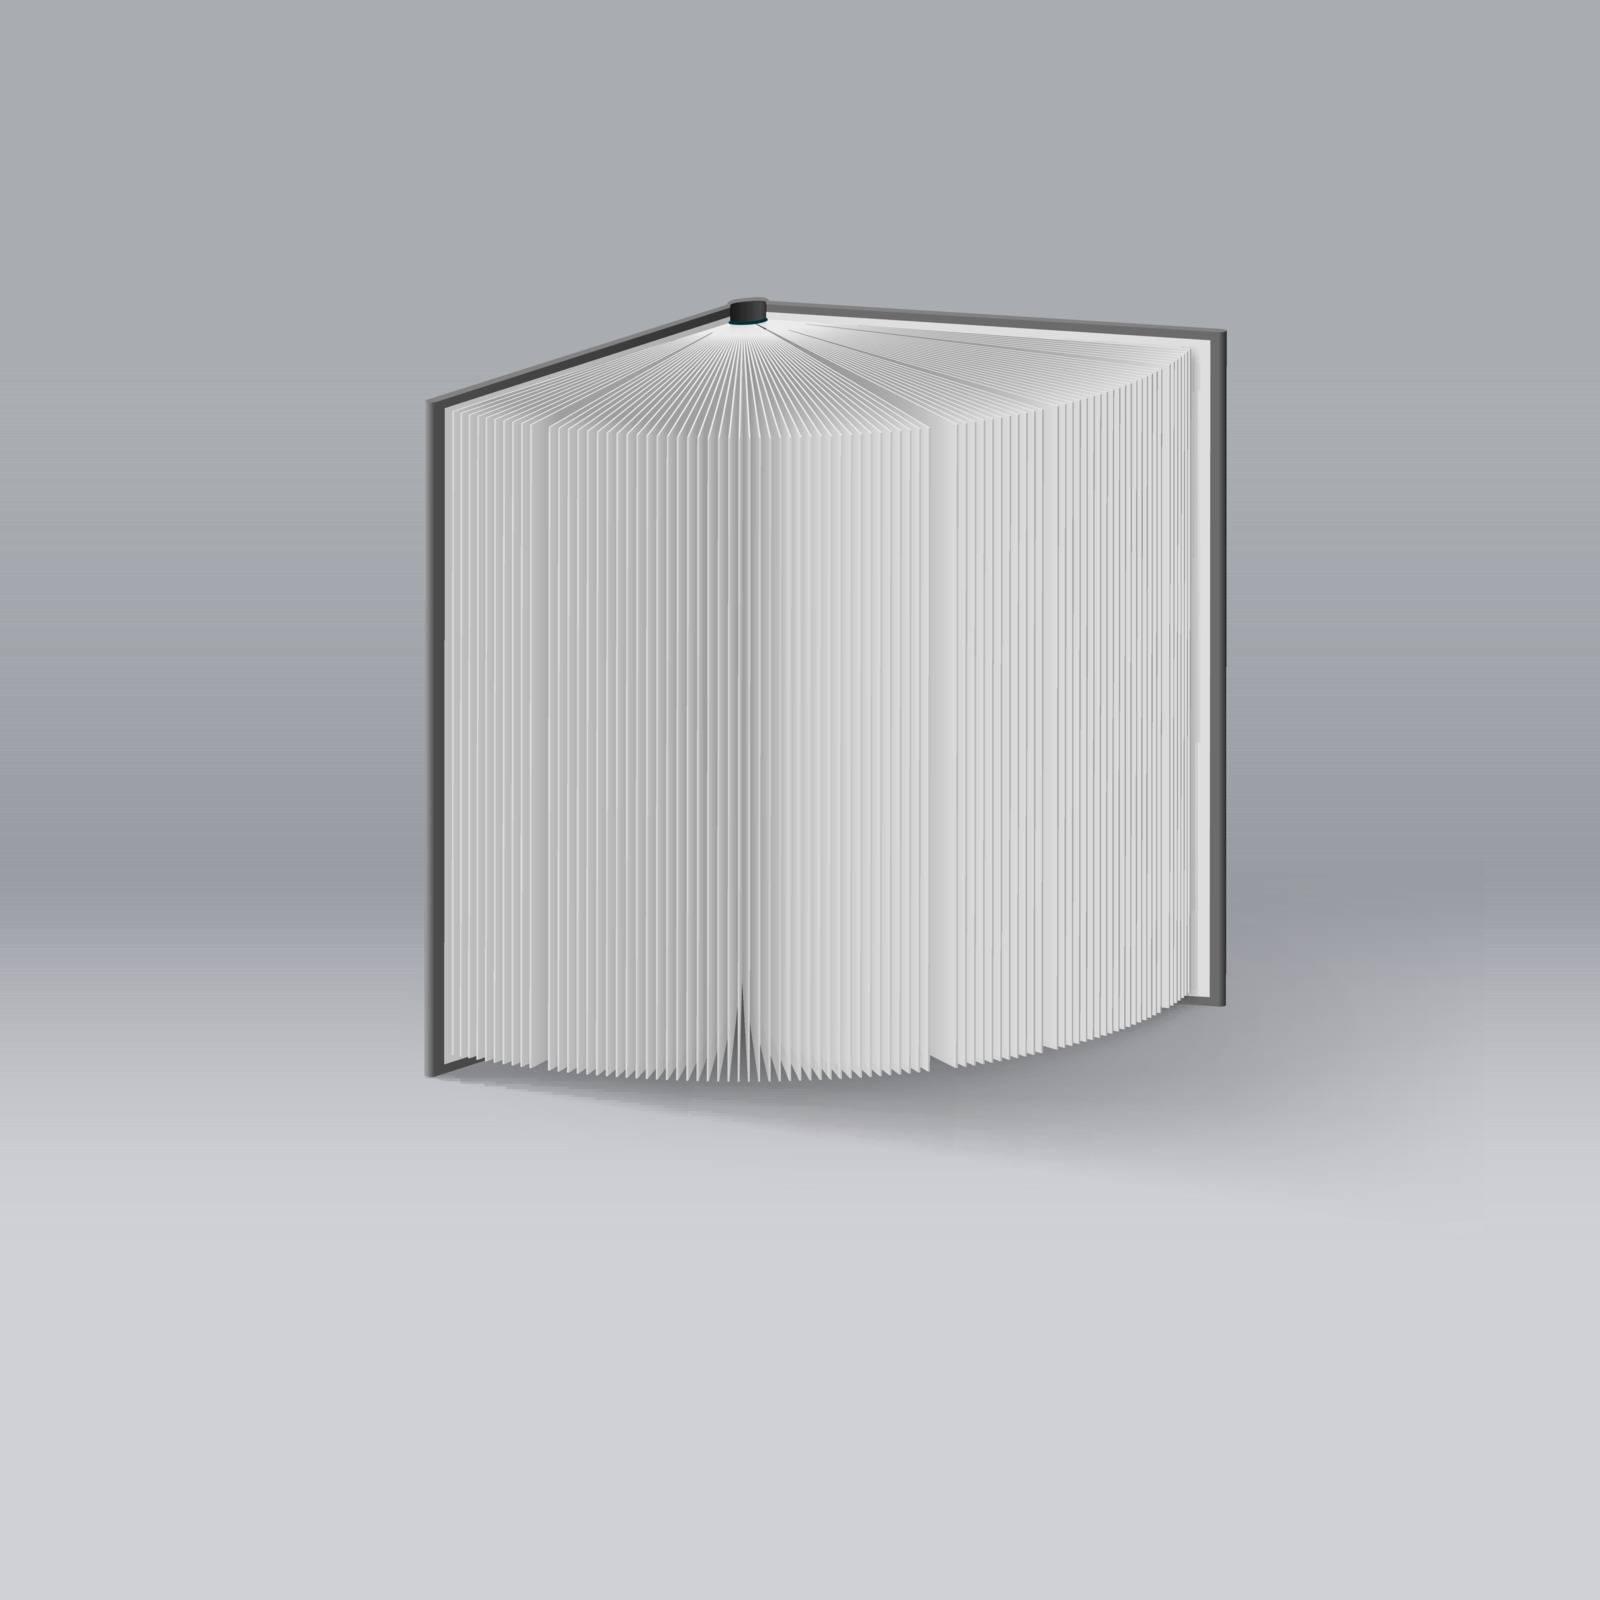 Open Book. Illustration on Deep Background. Mockup Template